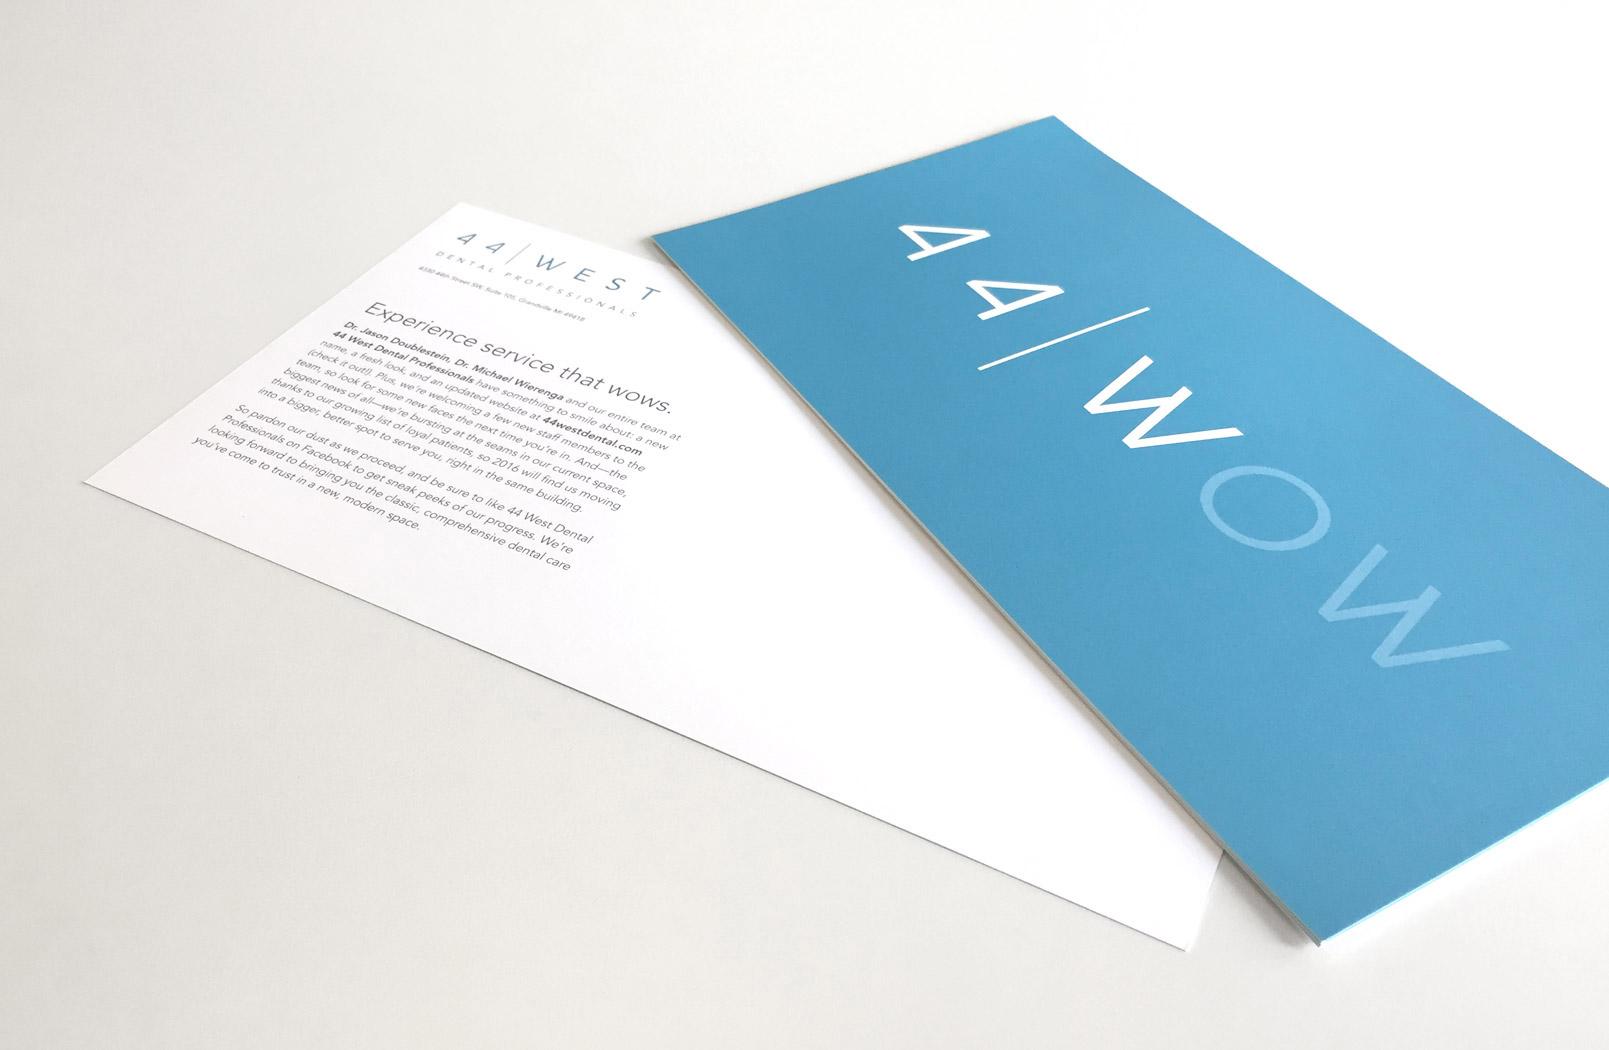 44W-Image-3